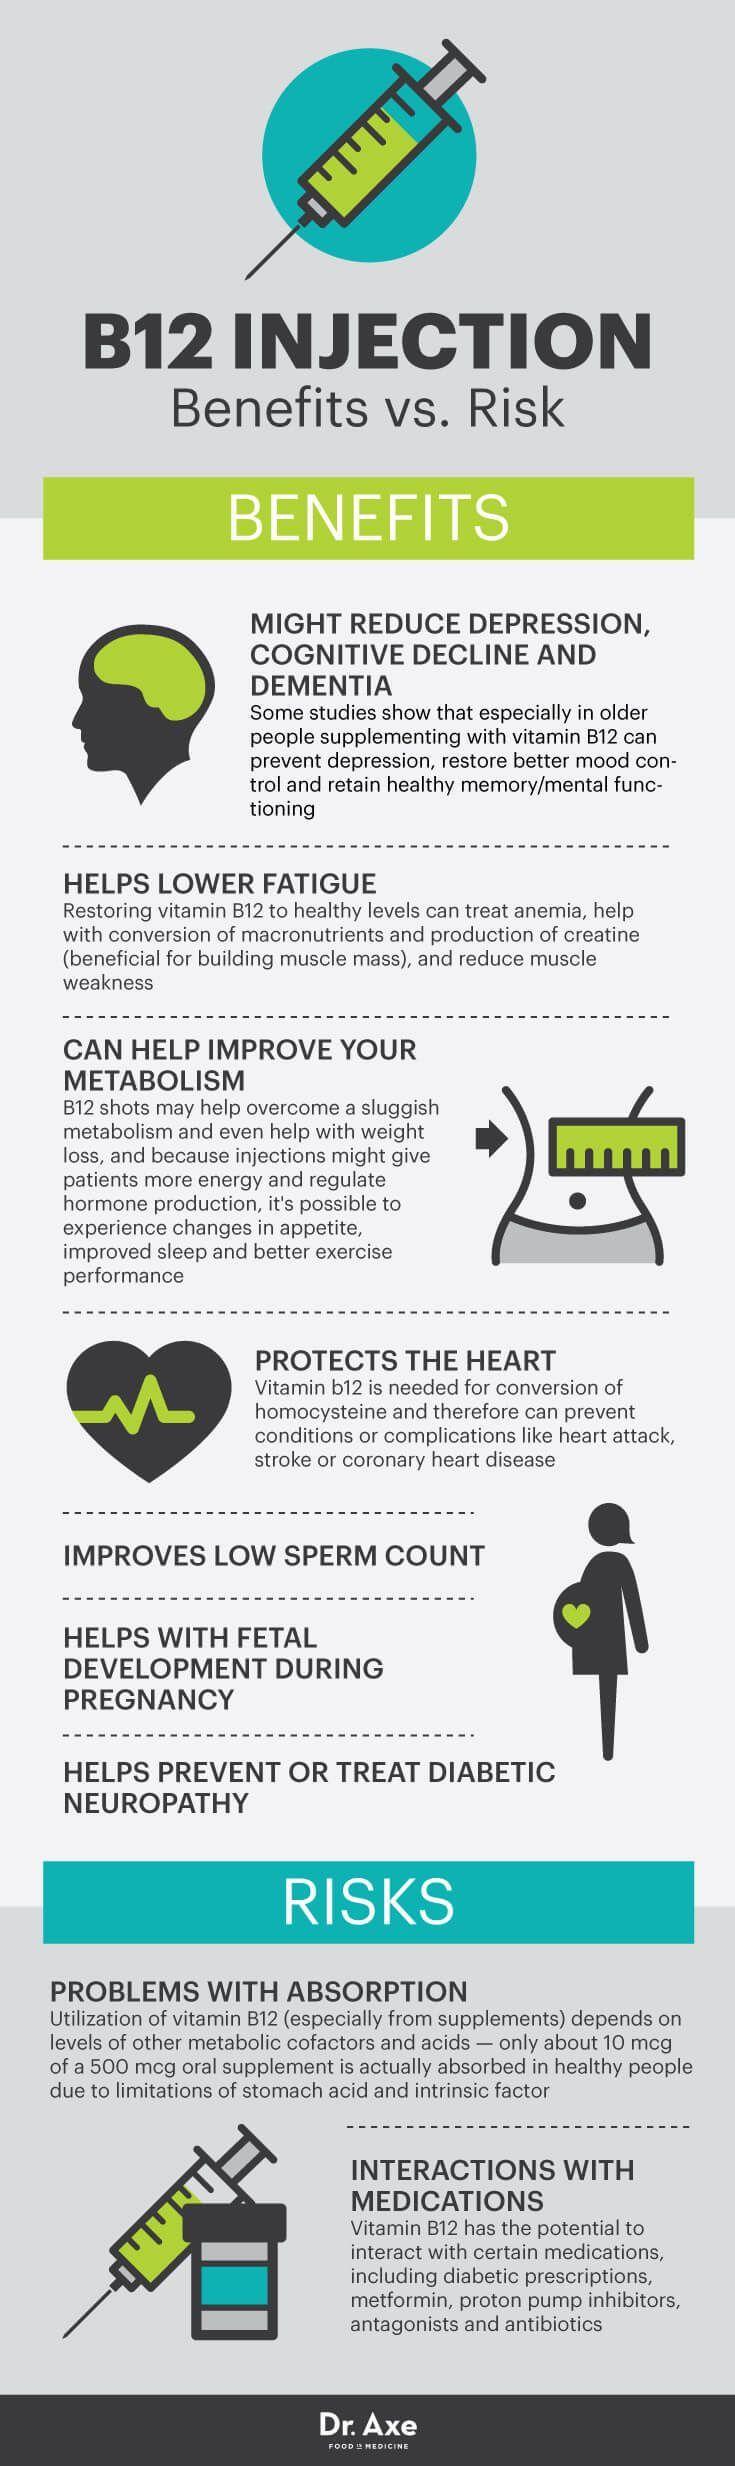 Vitamin B12 Injections Benefits, Risks & Better Alternatives? - Dr. Axe